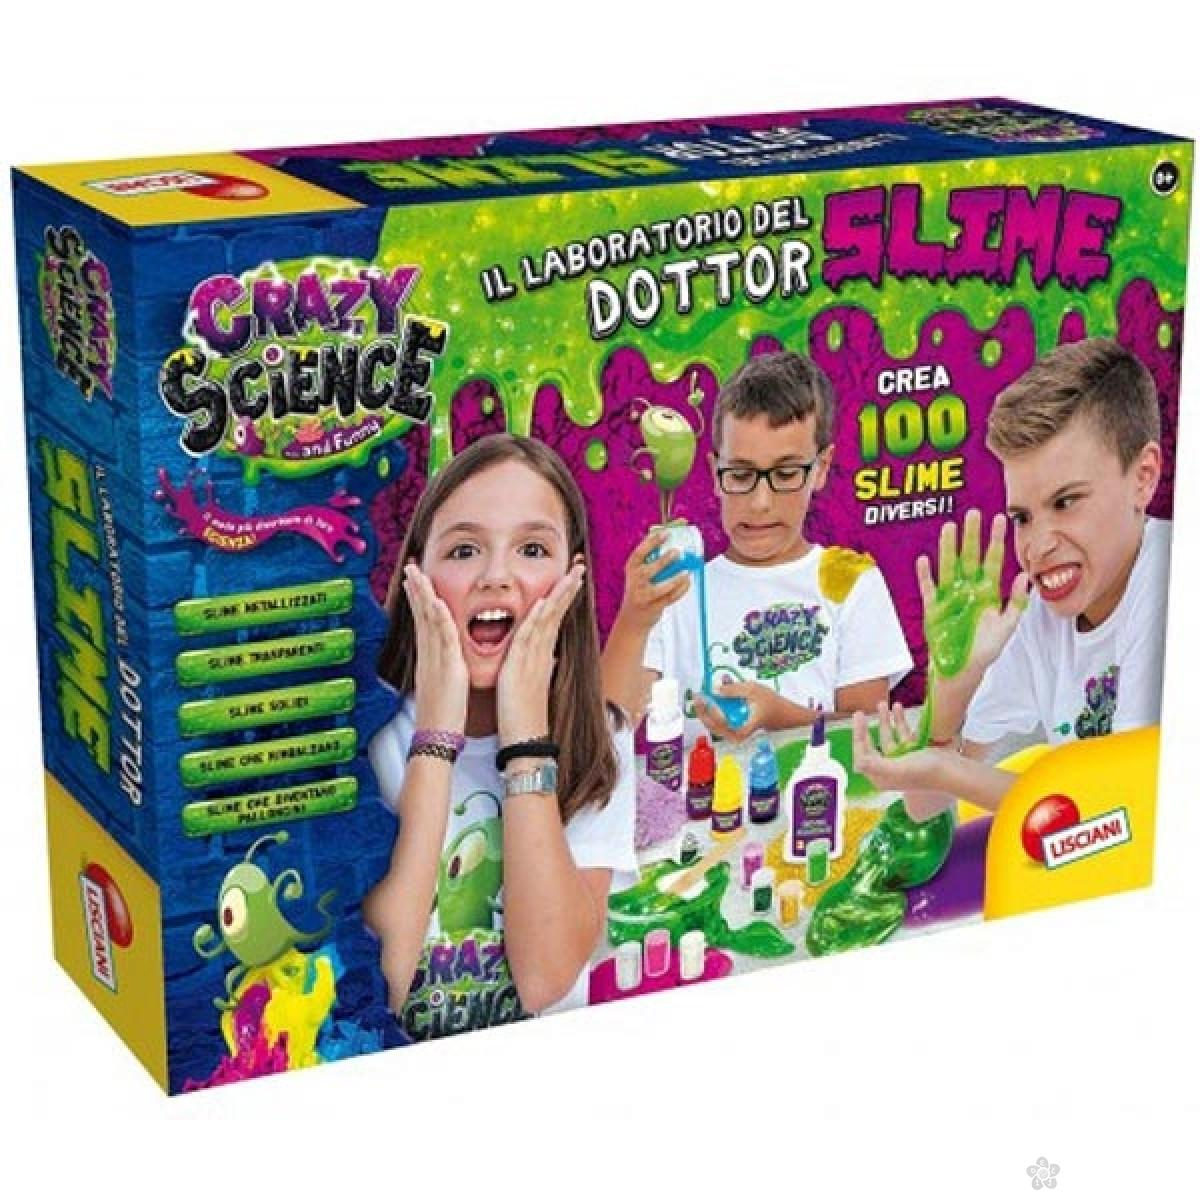 Velika Laboratorija Crazy Science Slime